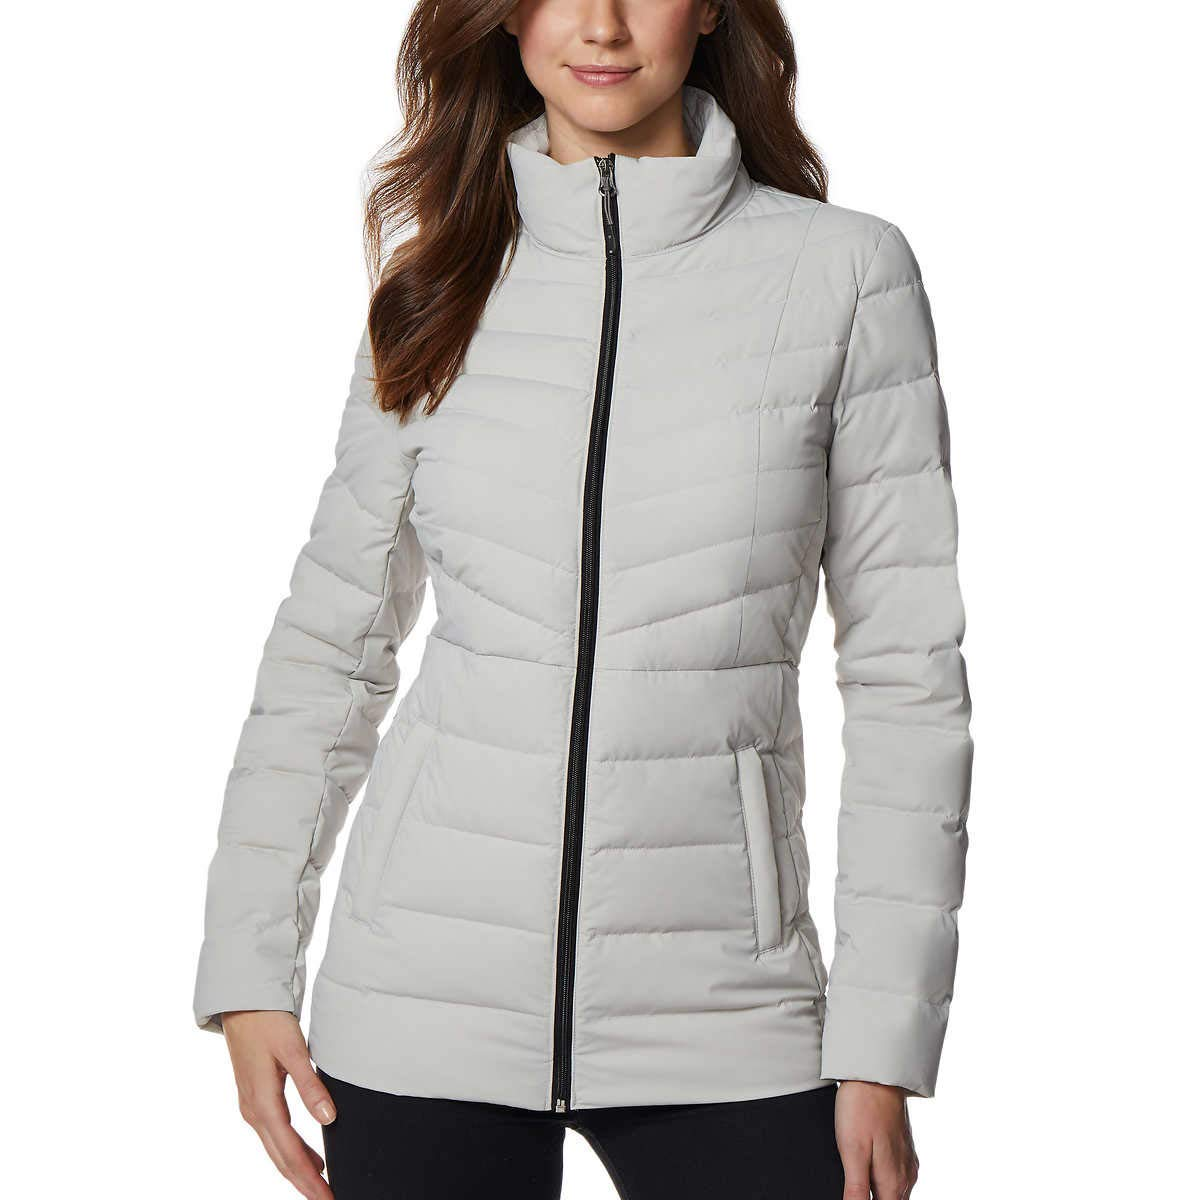 32 DEGREES Ladies 4-Way Stretch Jacket